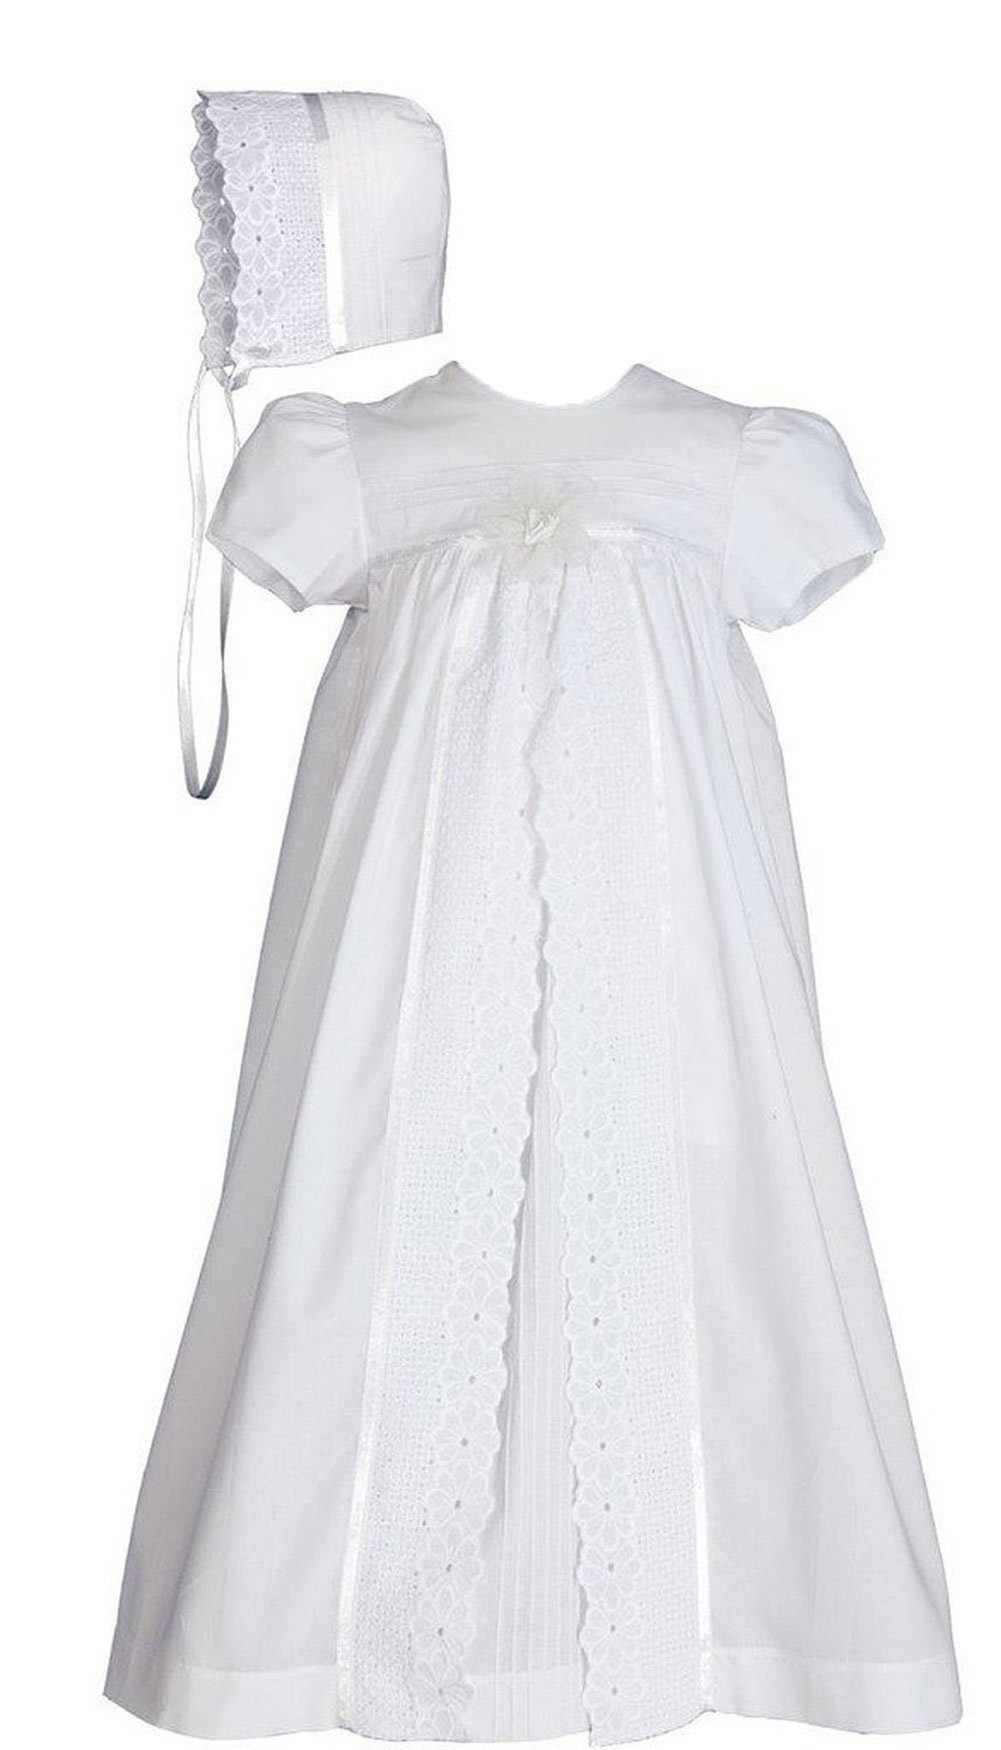 25'' Girls Split Panel Cotton Dress Christening Gown Baptism Gown 12M